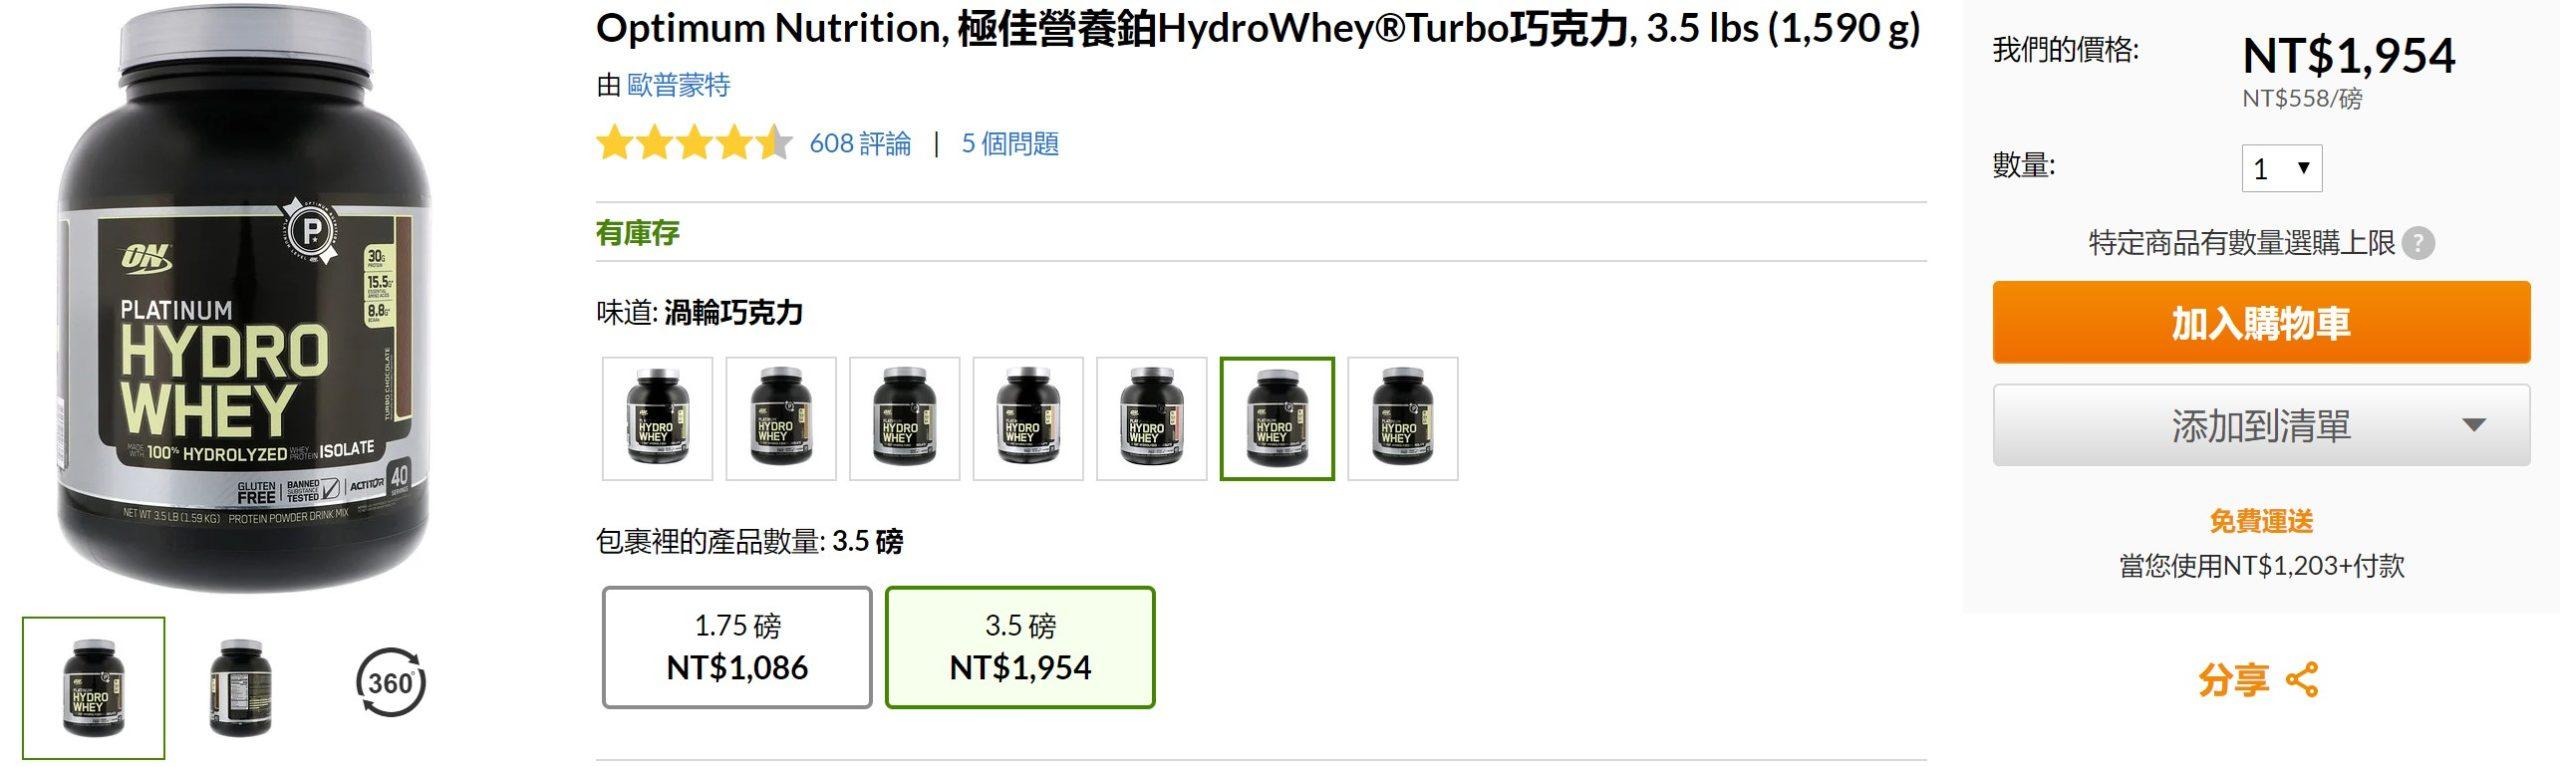 Optimum-Nutrition-極佳營養鉑HydroWhey®Turbo巧克力-3.5-lbs-1590-g